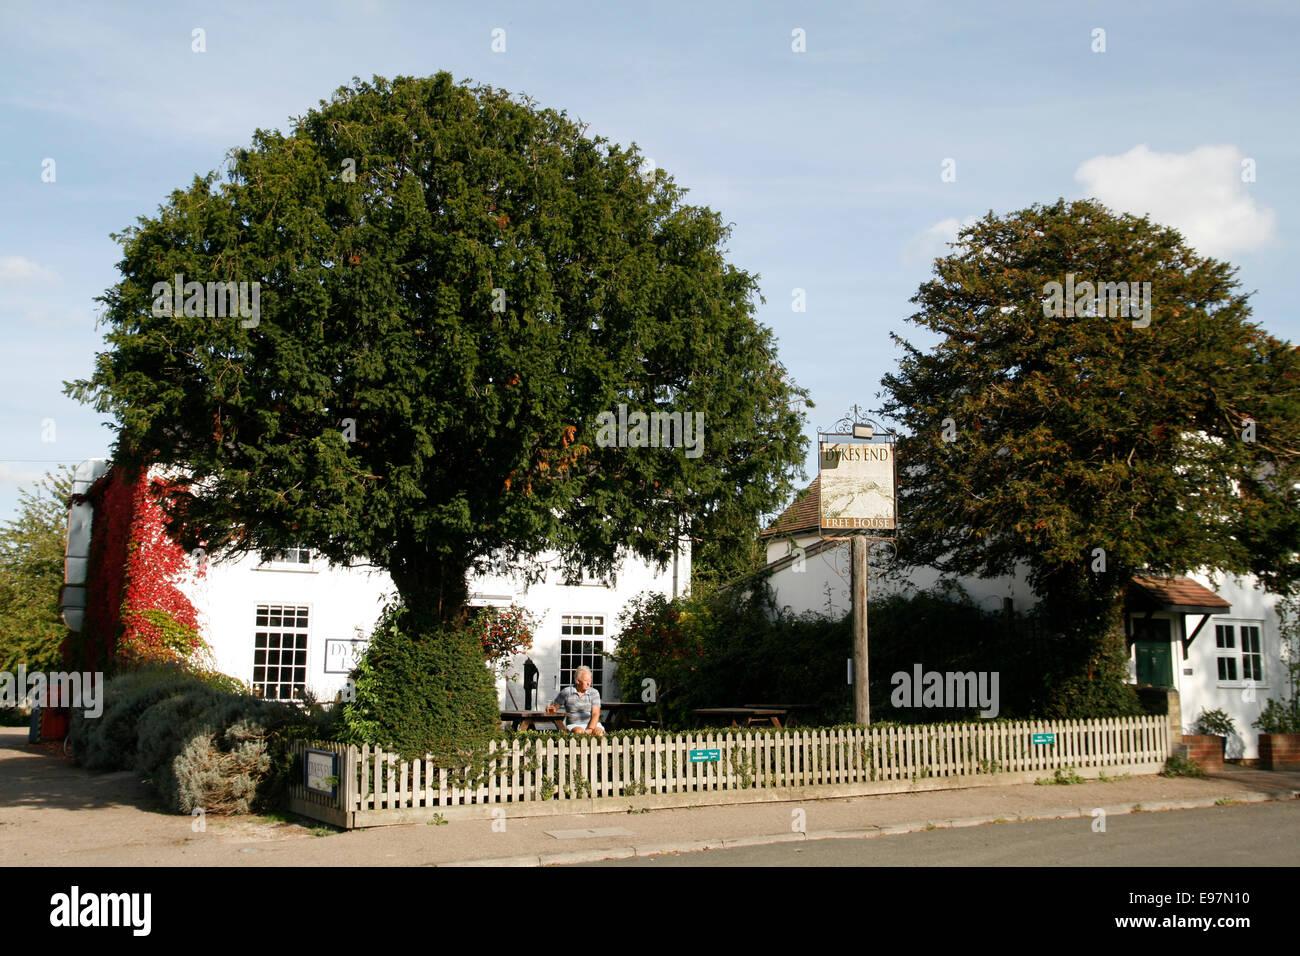 Dyke's End Inn Reach Cambridgeshire England UK - Stock Image